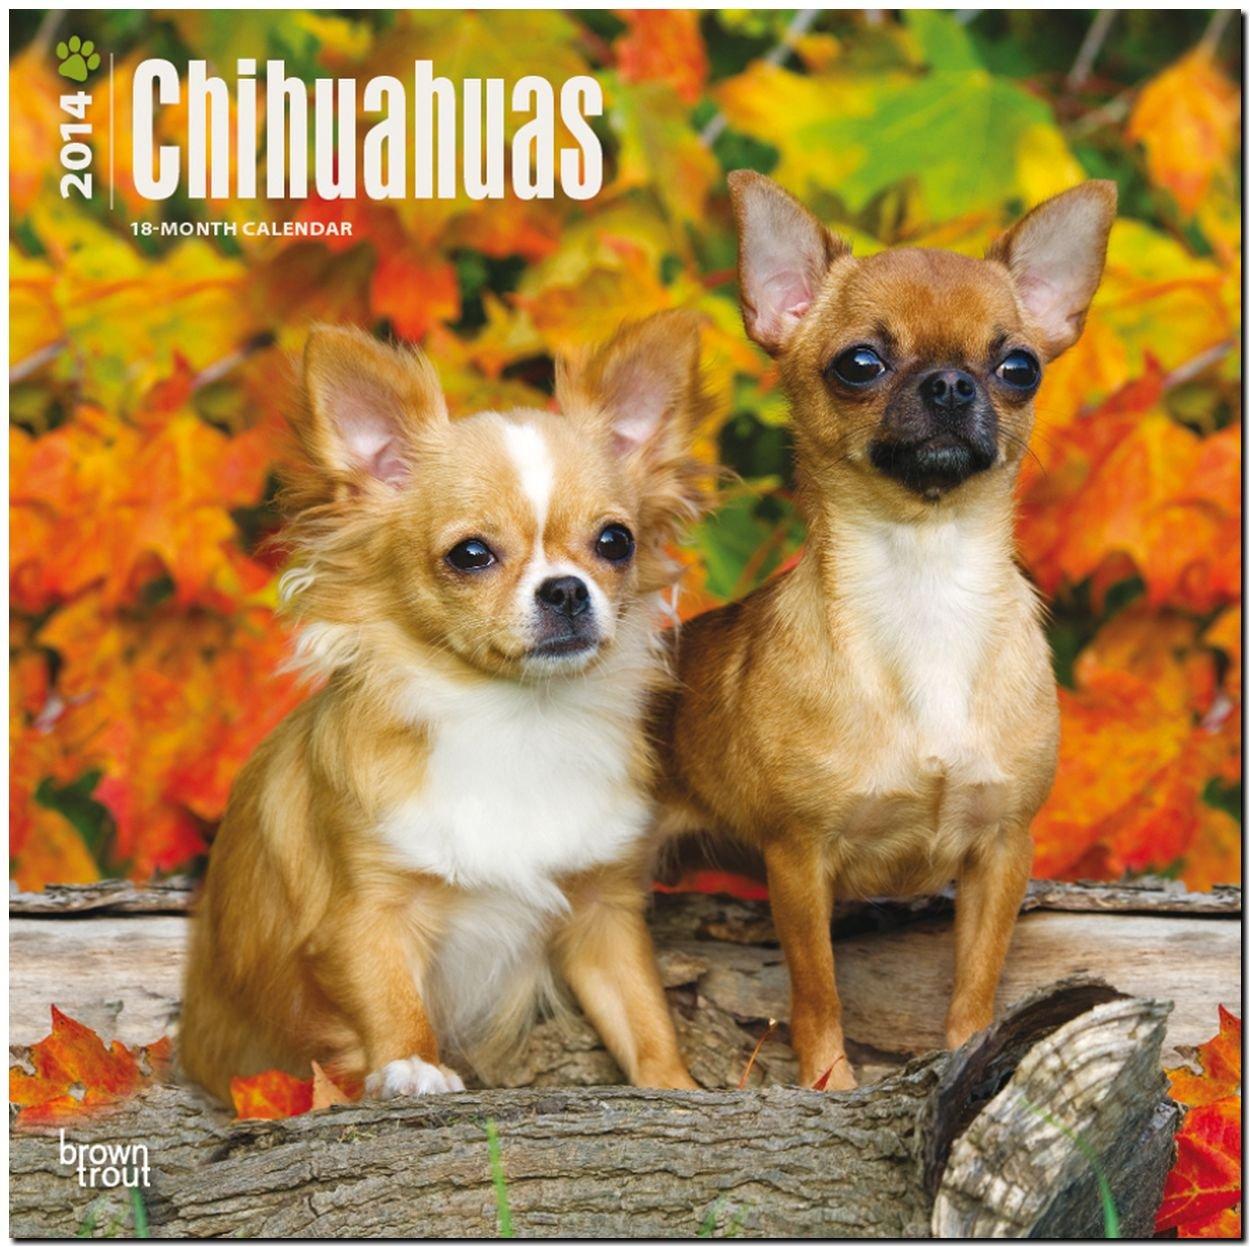 Chihuahuas 2014: Original BrownTrout-Kalender [Mehrsprachig] [Kalender]